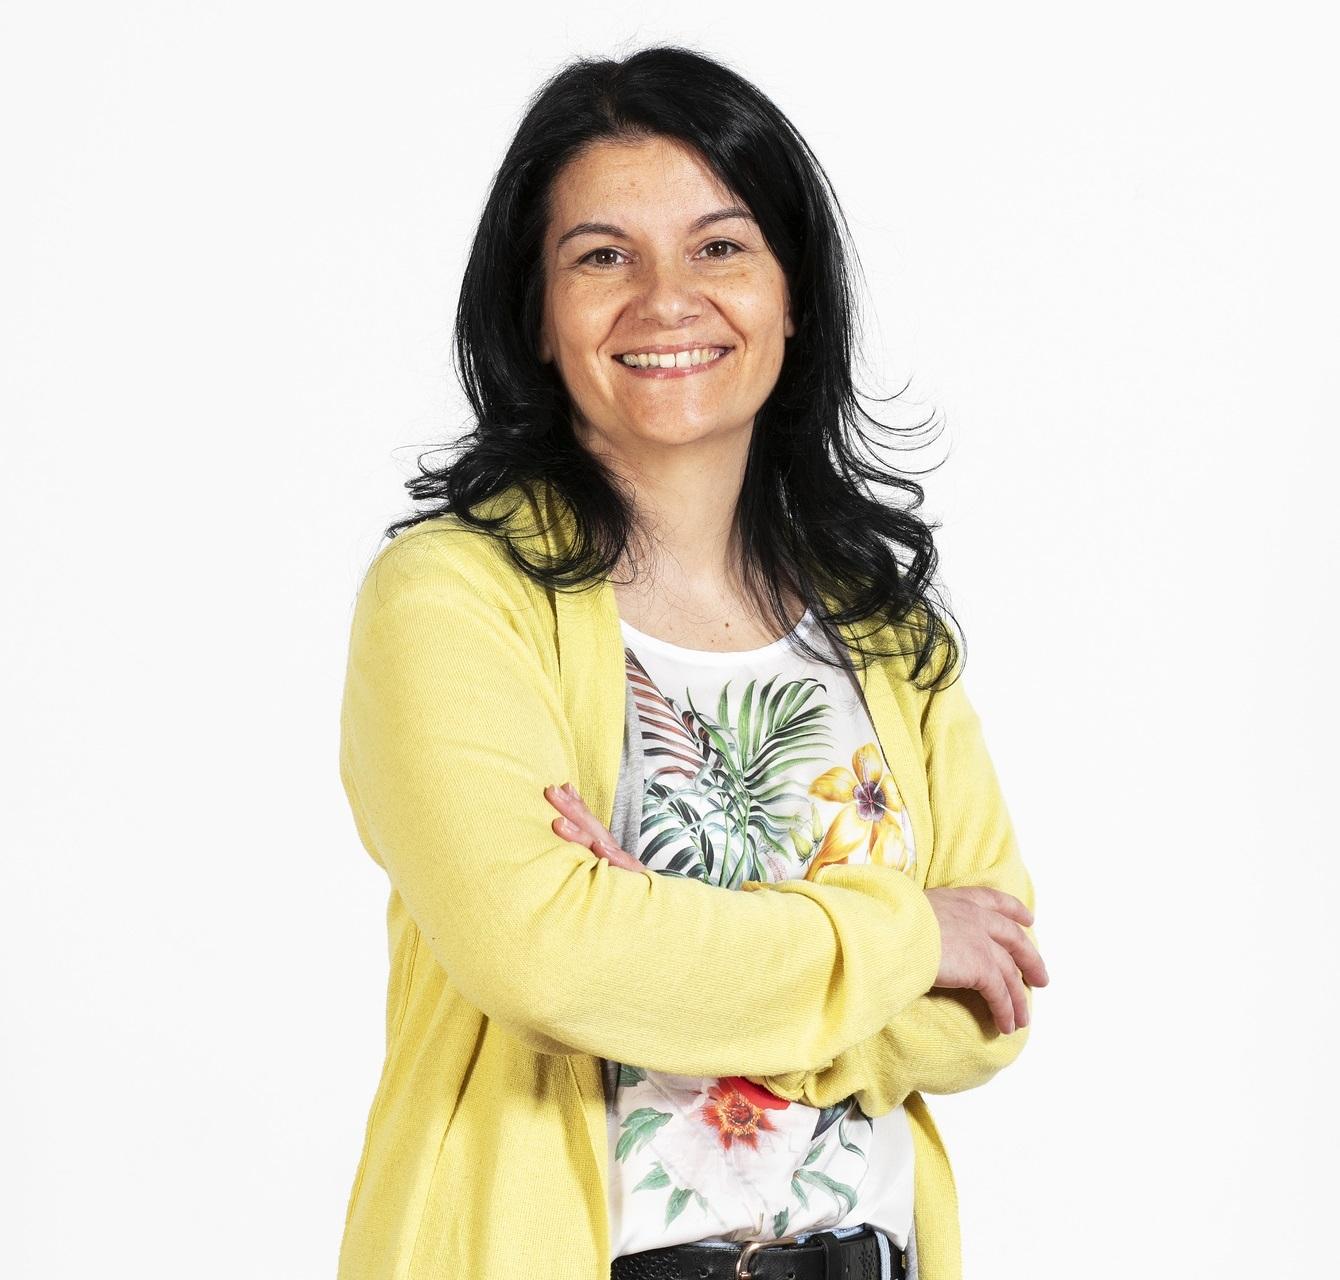 Mariza Madeiras